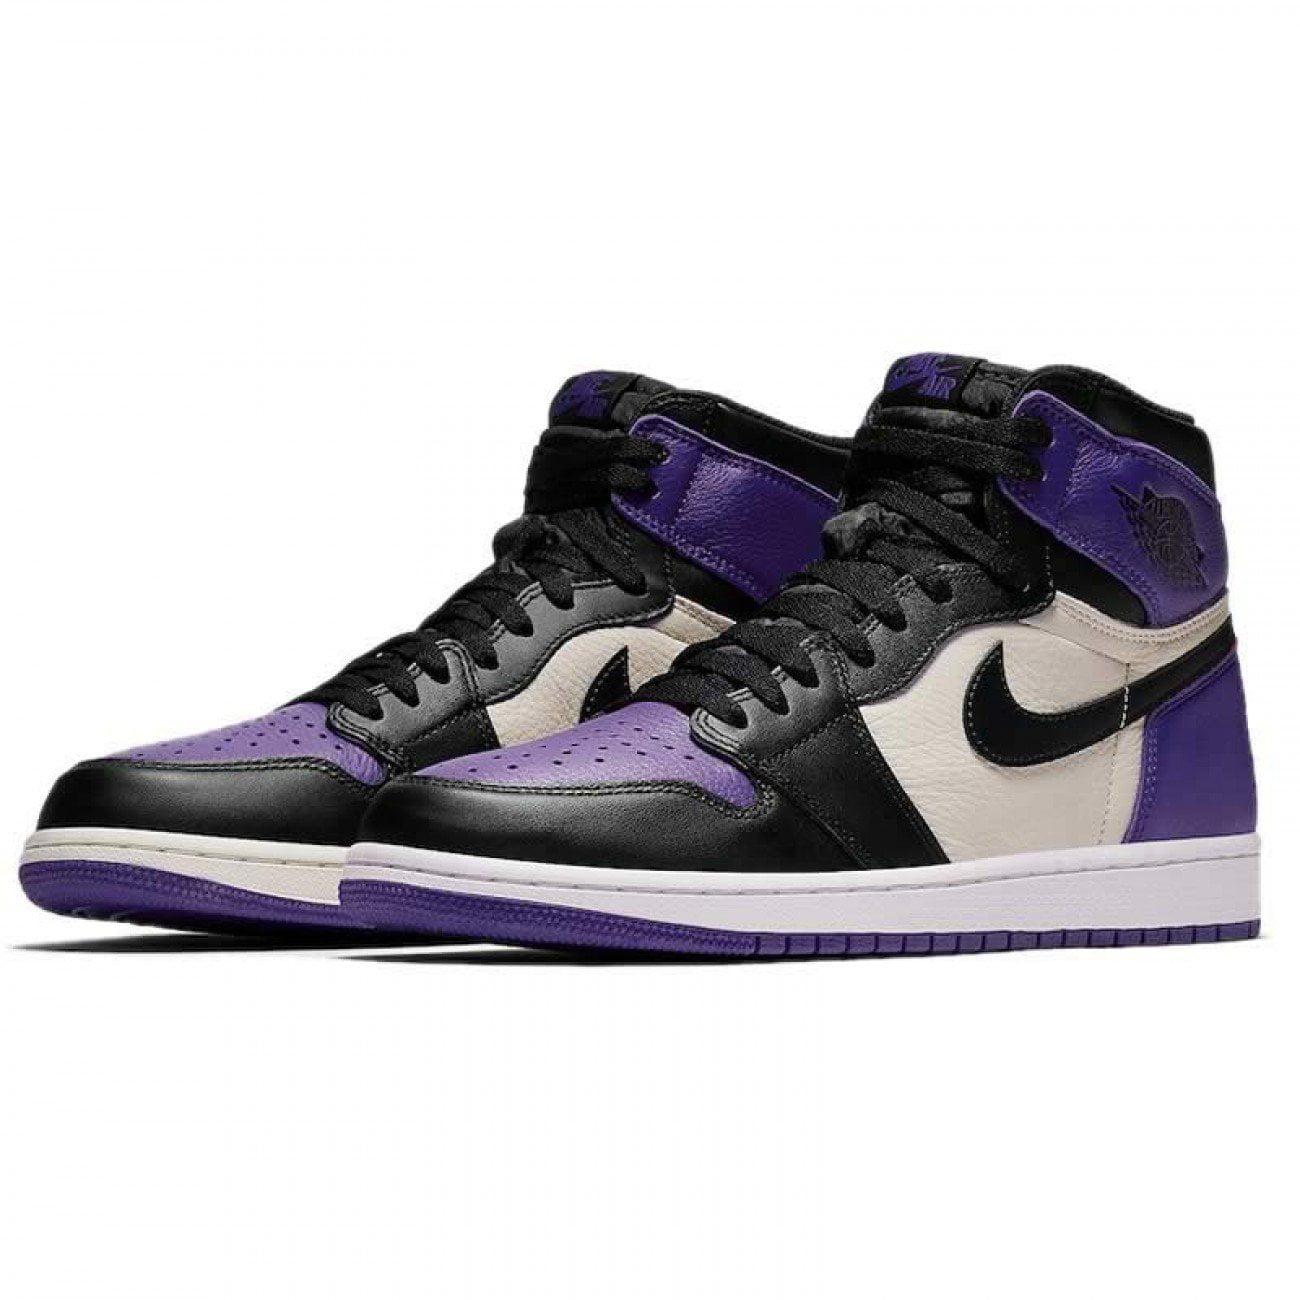 Mens Air Jordan 1 Retro High OG Court Purple Sail Black 555088-501 - Walmart.com